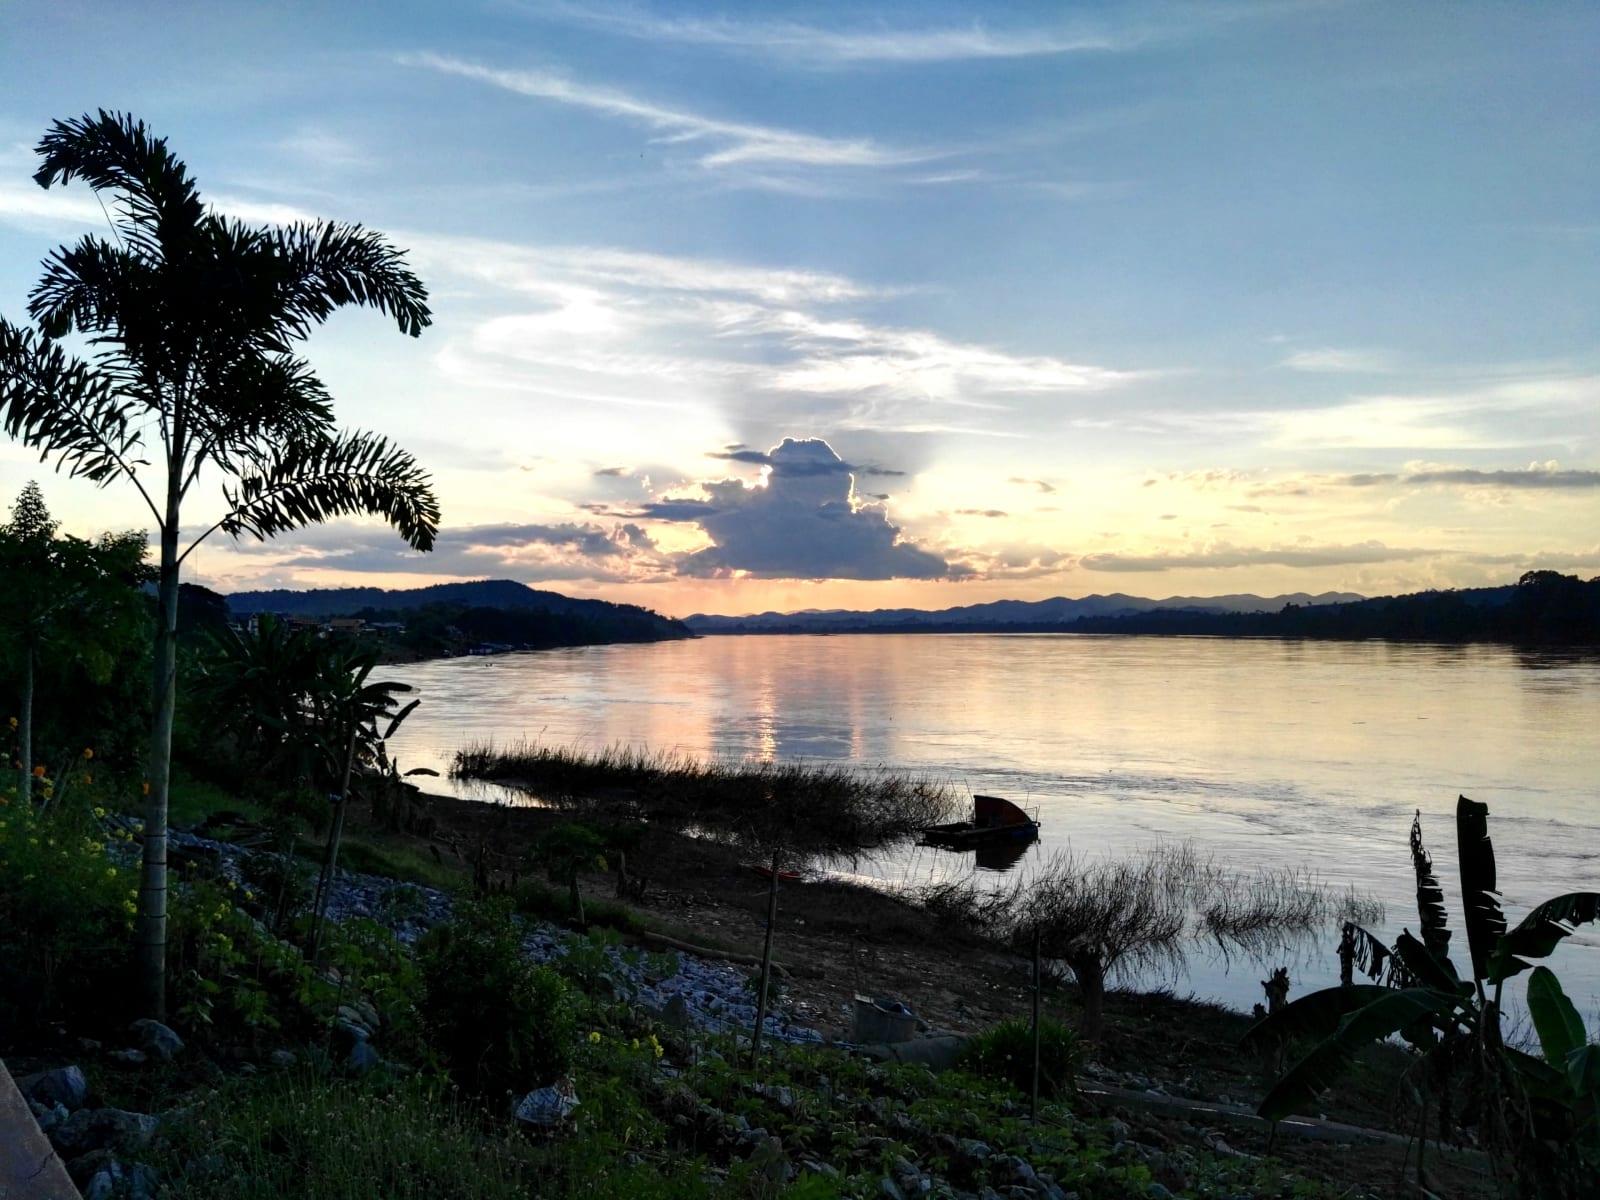 Promenáda a západ slunce nad Mekongem, Chiang Khan, Loei, Thajsko